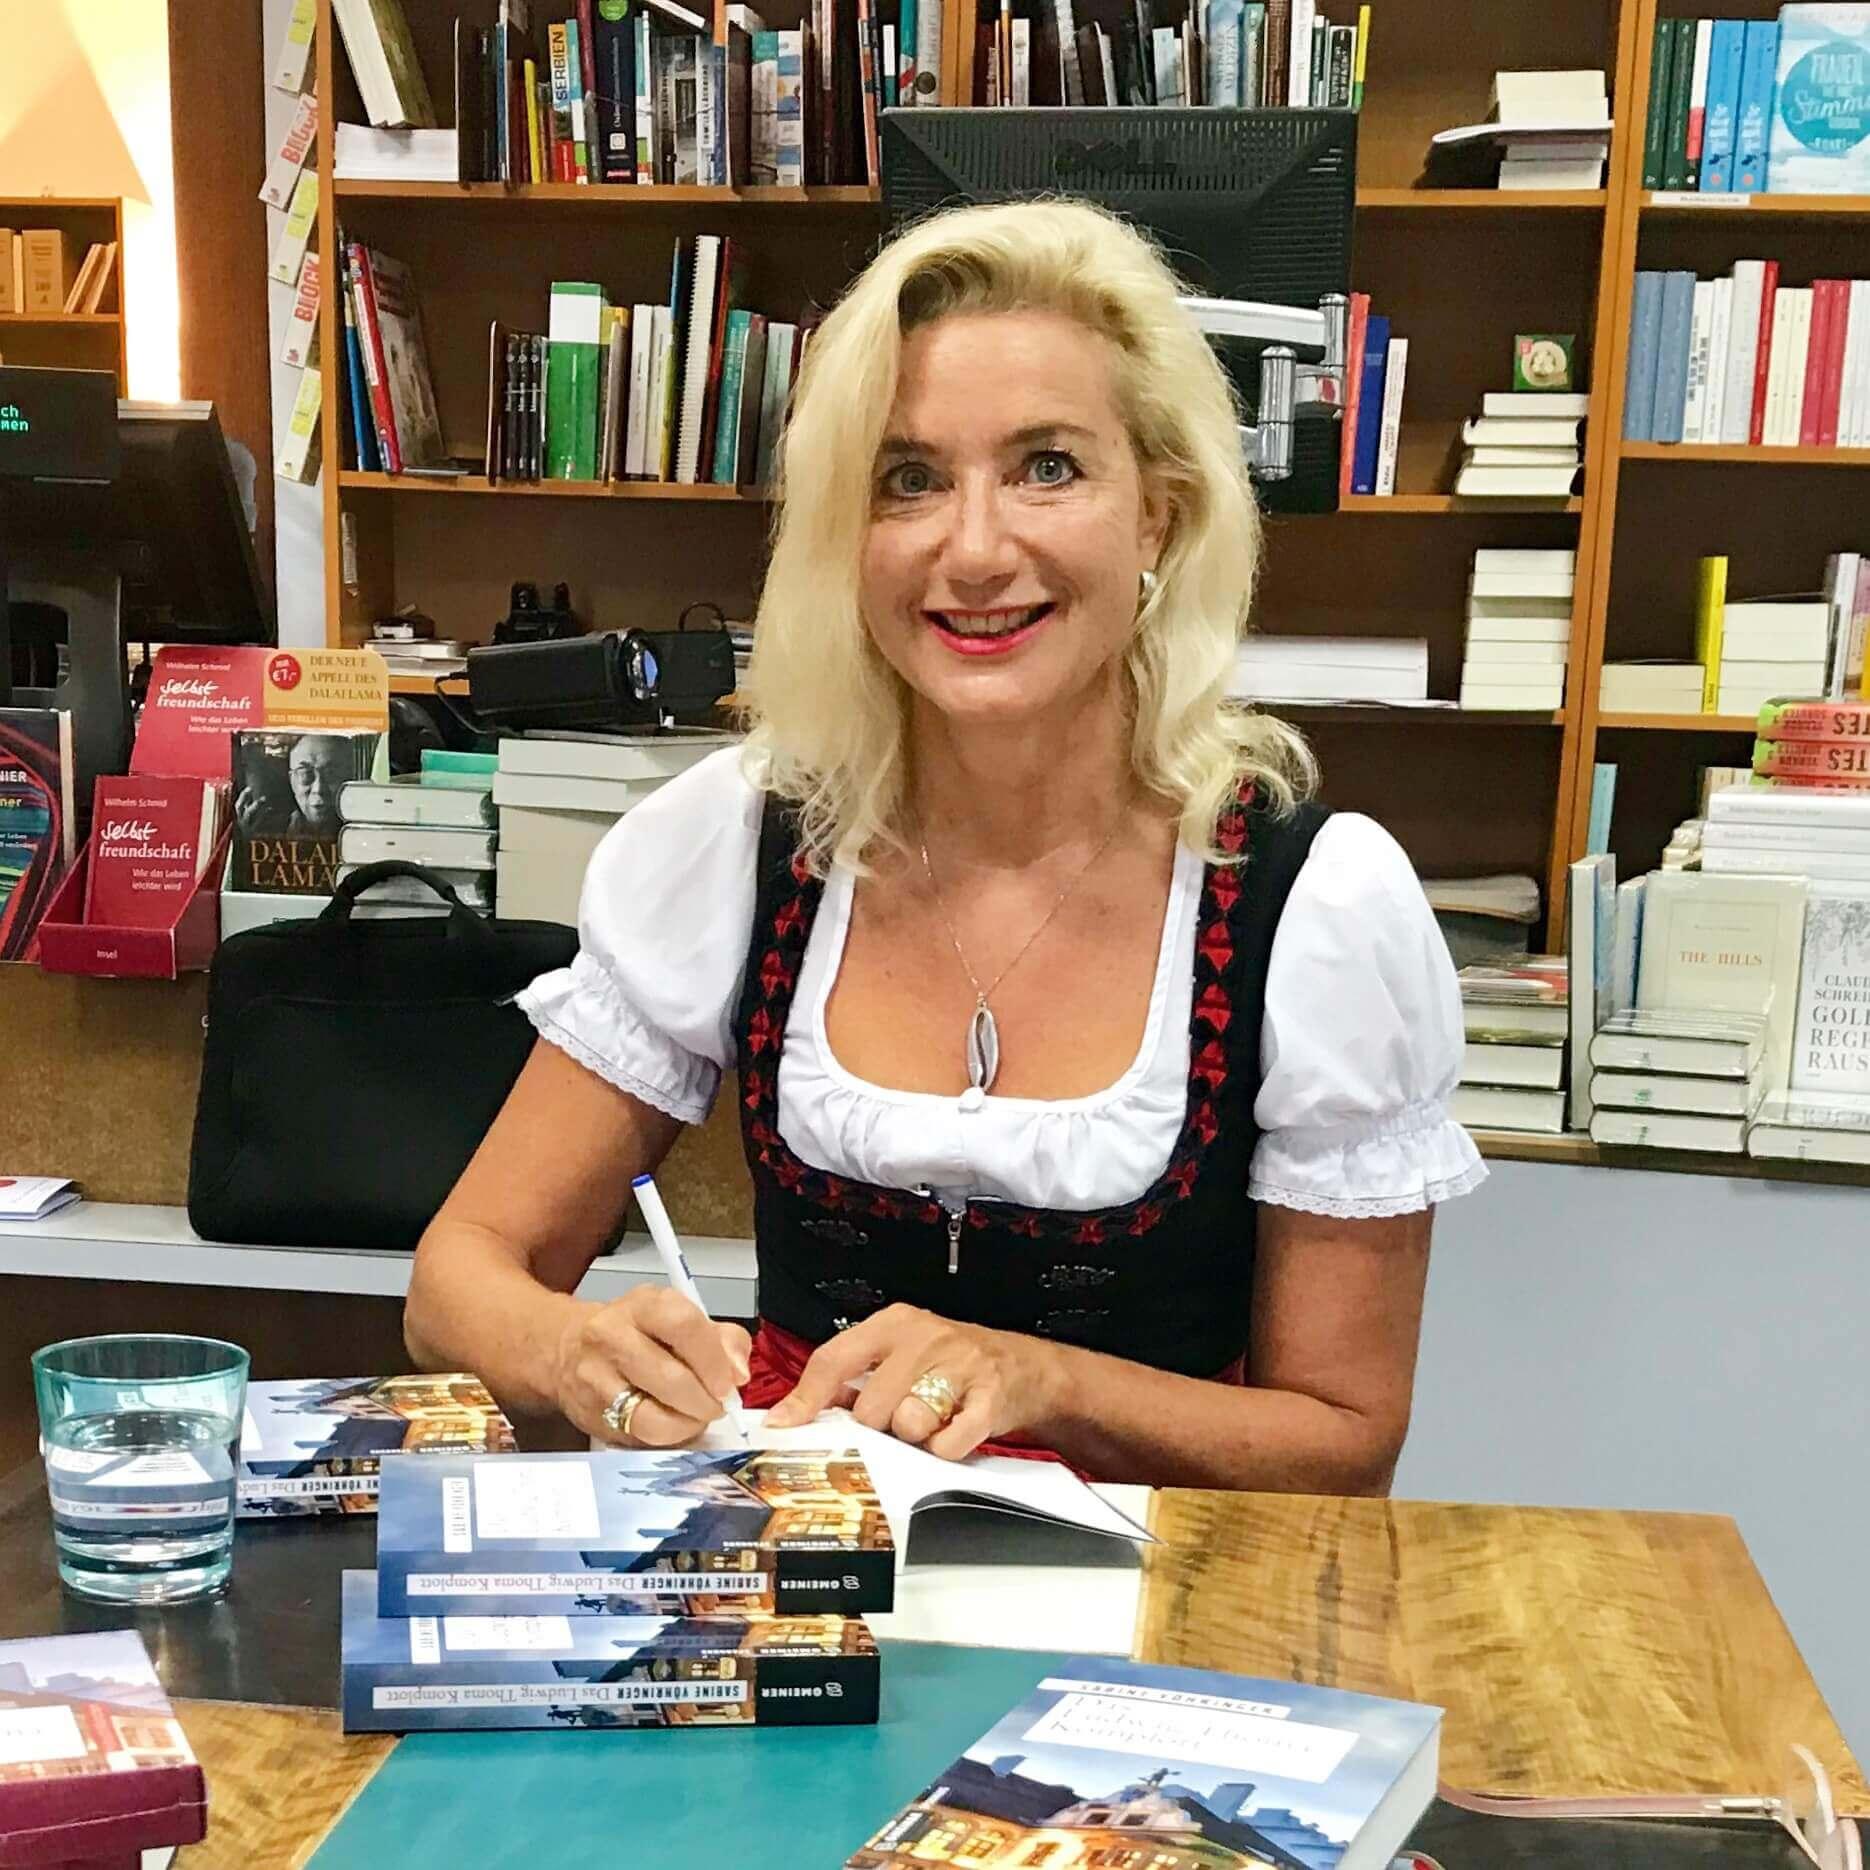 Sabine Voehringer, Ludwig Thoma Komplott Muenchen 1a.jpg